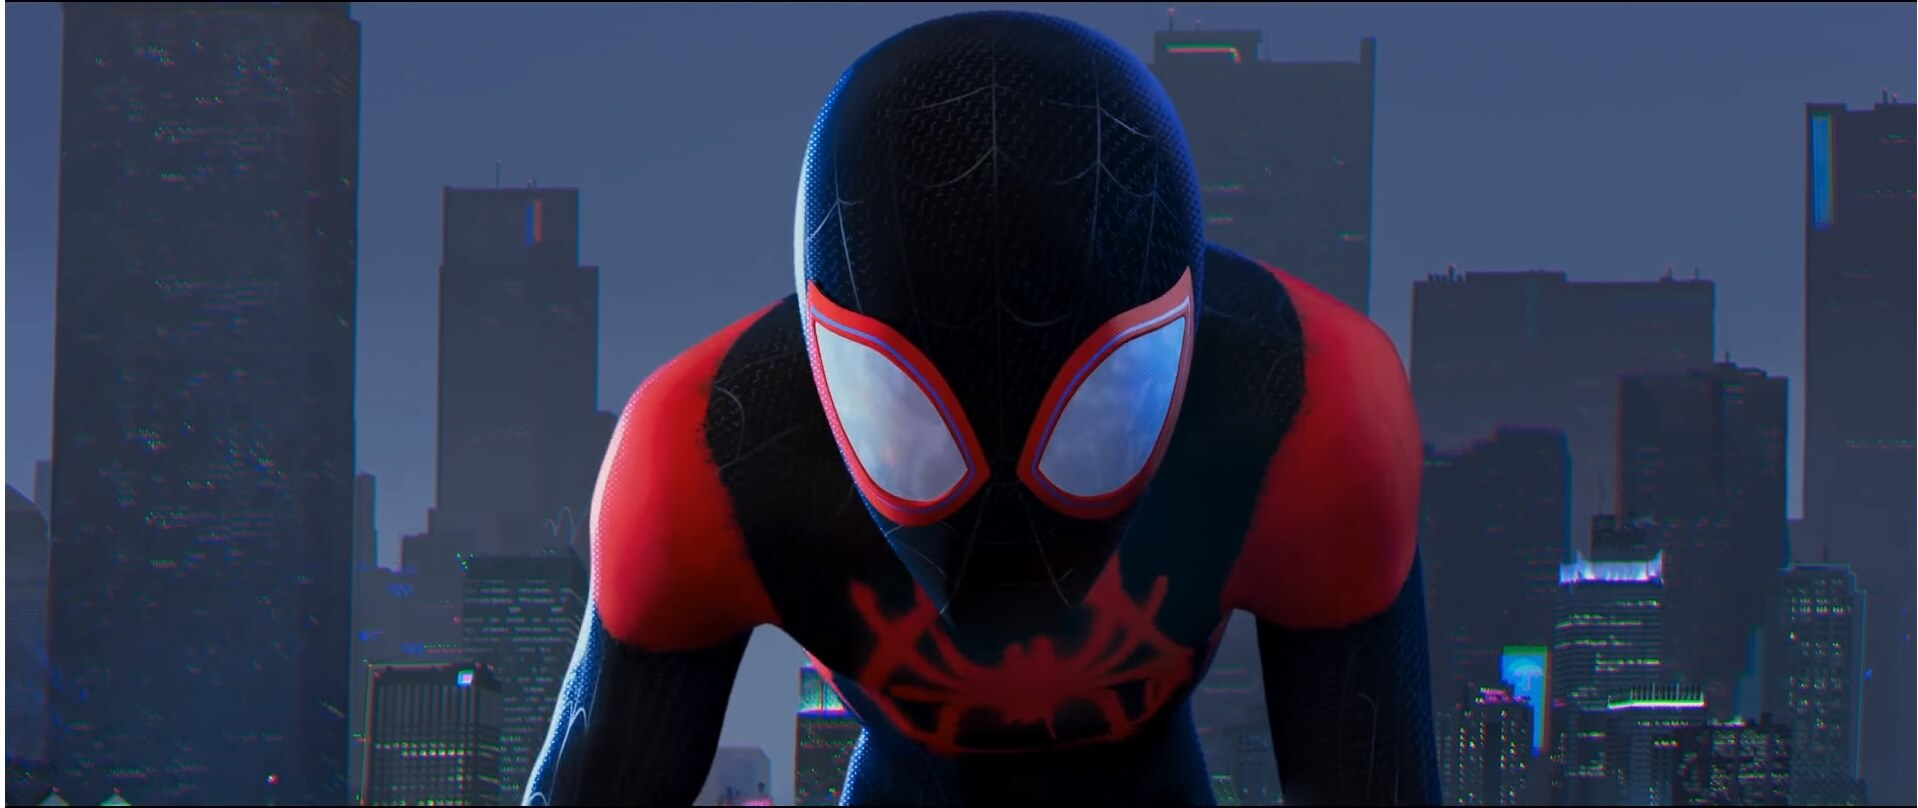 spiderman steven crowder takes - HD1920×802